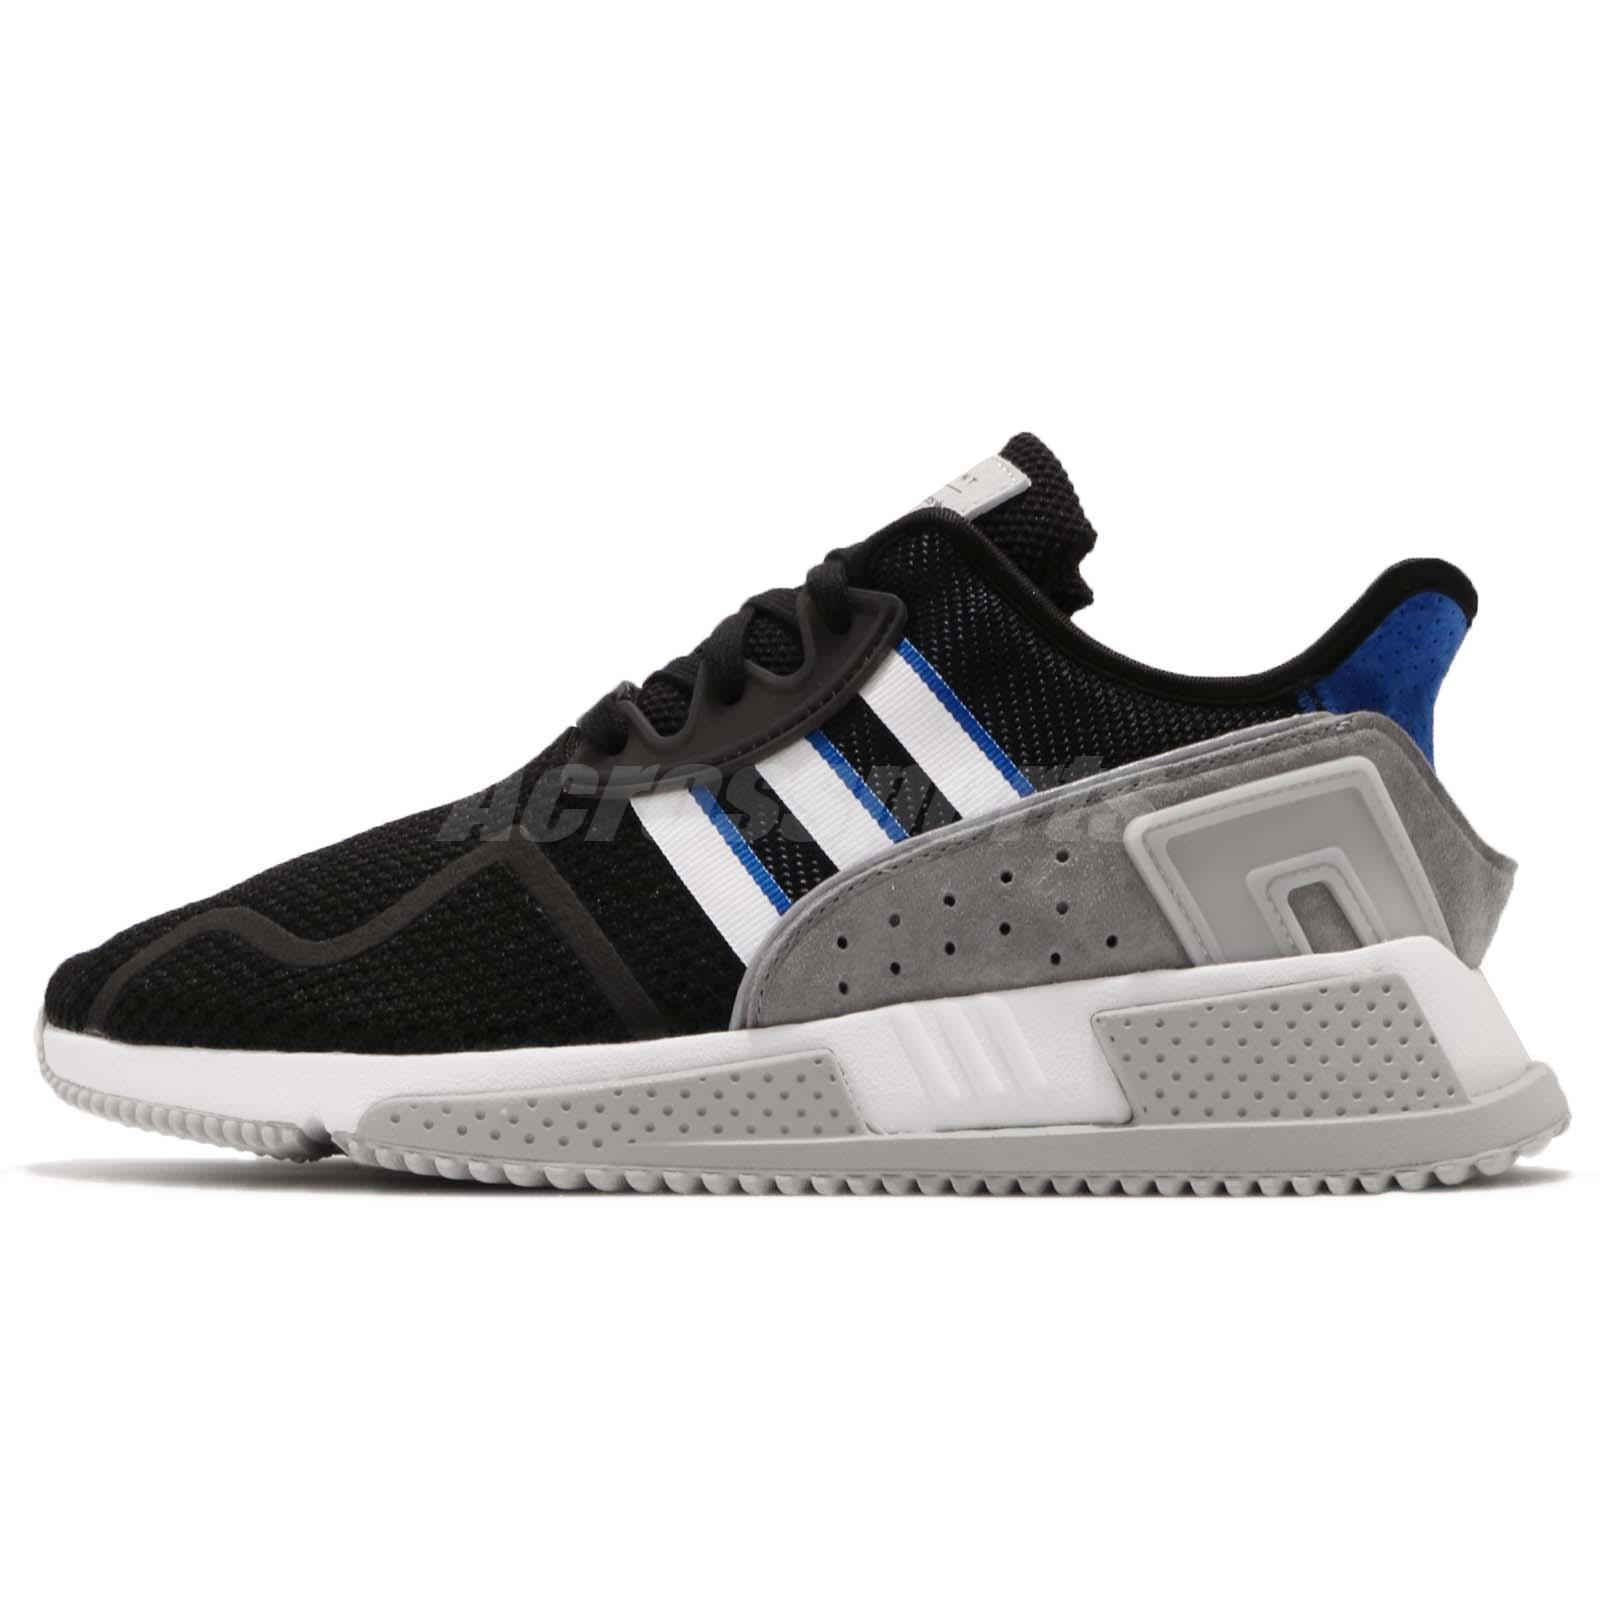 best service ba8bd ffbca adidas Originals EQT Cushion ADV Black Grey Blue Men Running Shoe Sneaker  BB7177